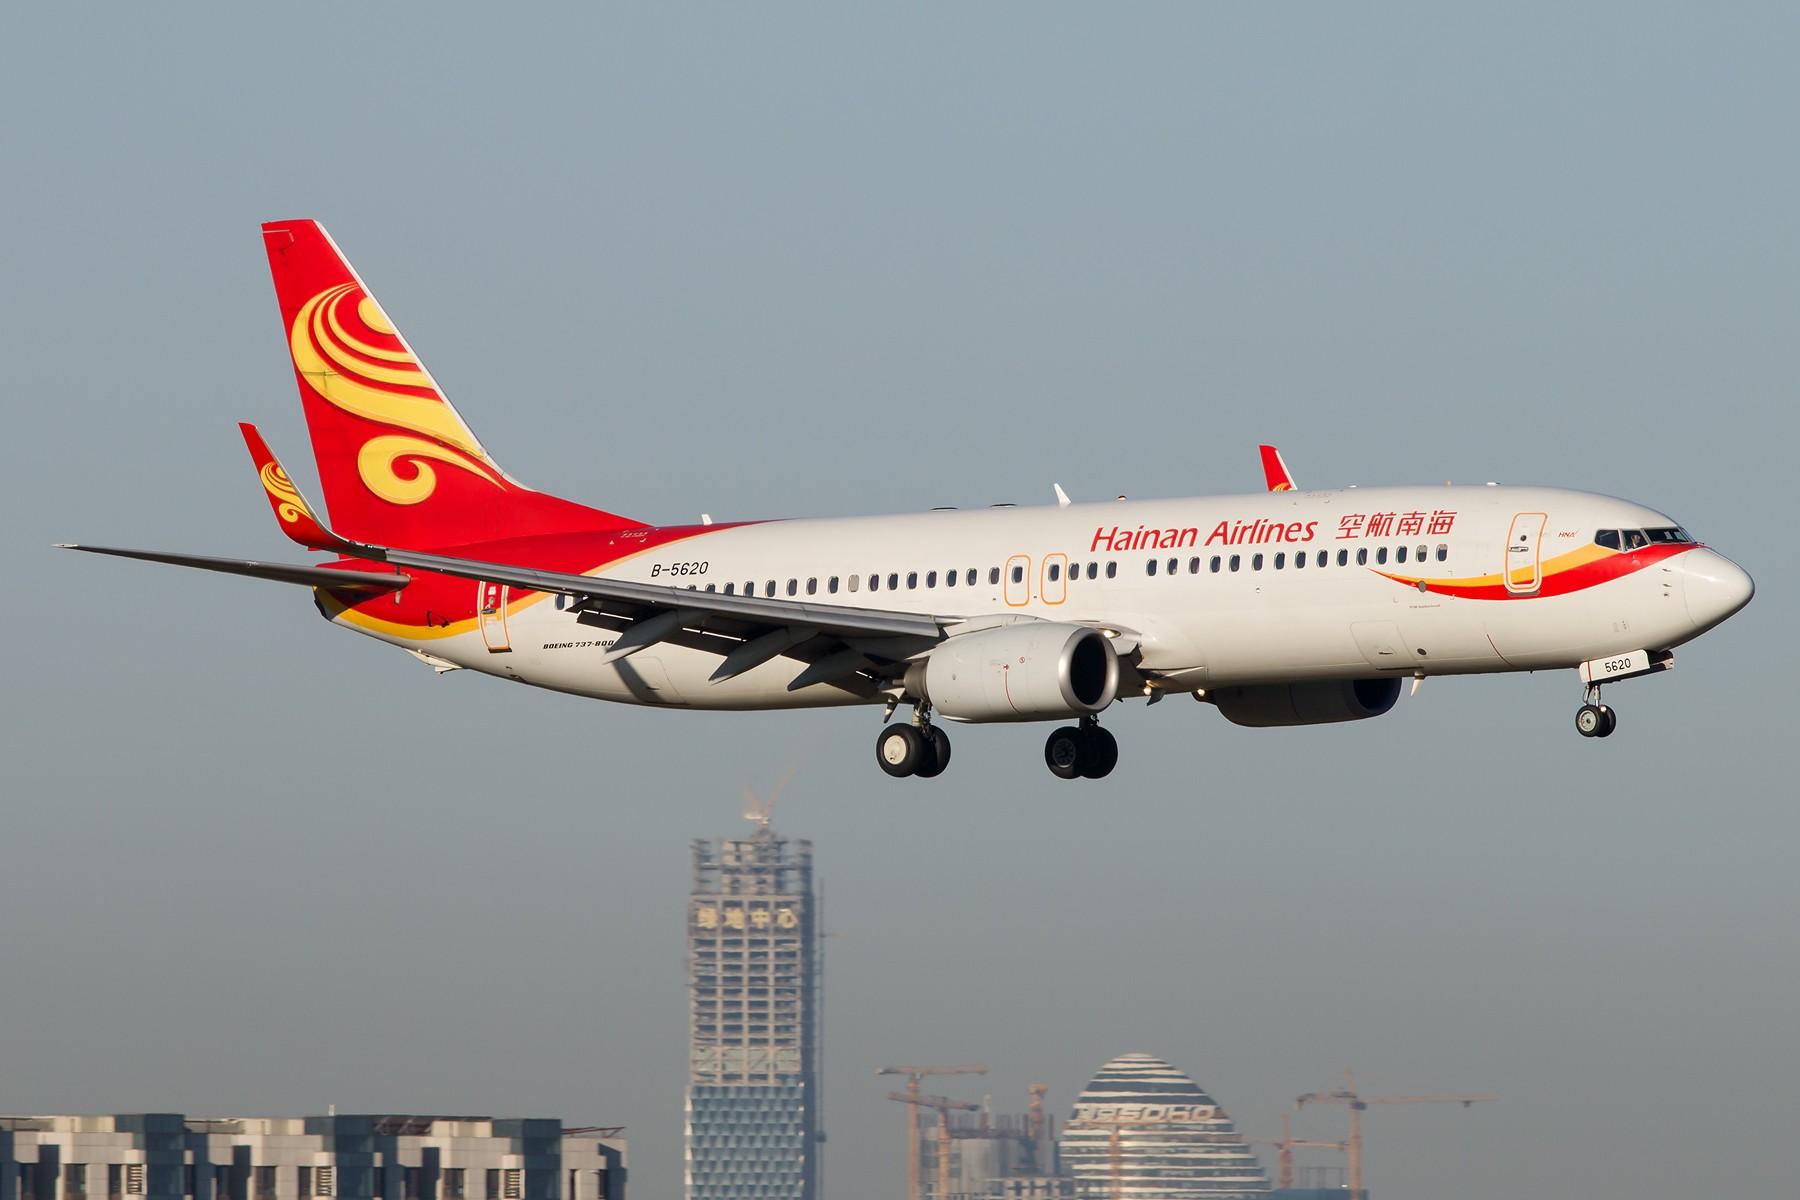 Re:[原创]周末晨练10张 1800*1200 BOEING 737-800 B-5620 中国北京首都国际机场